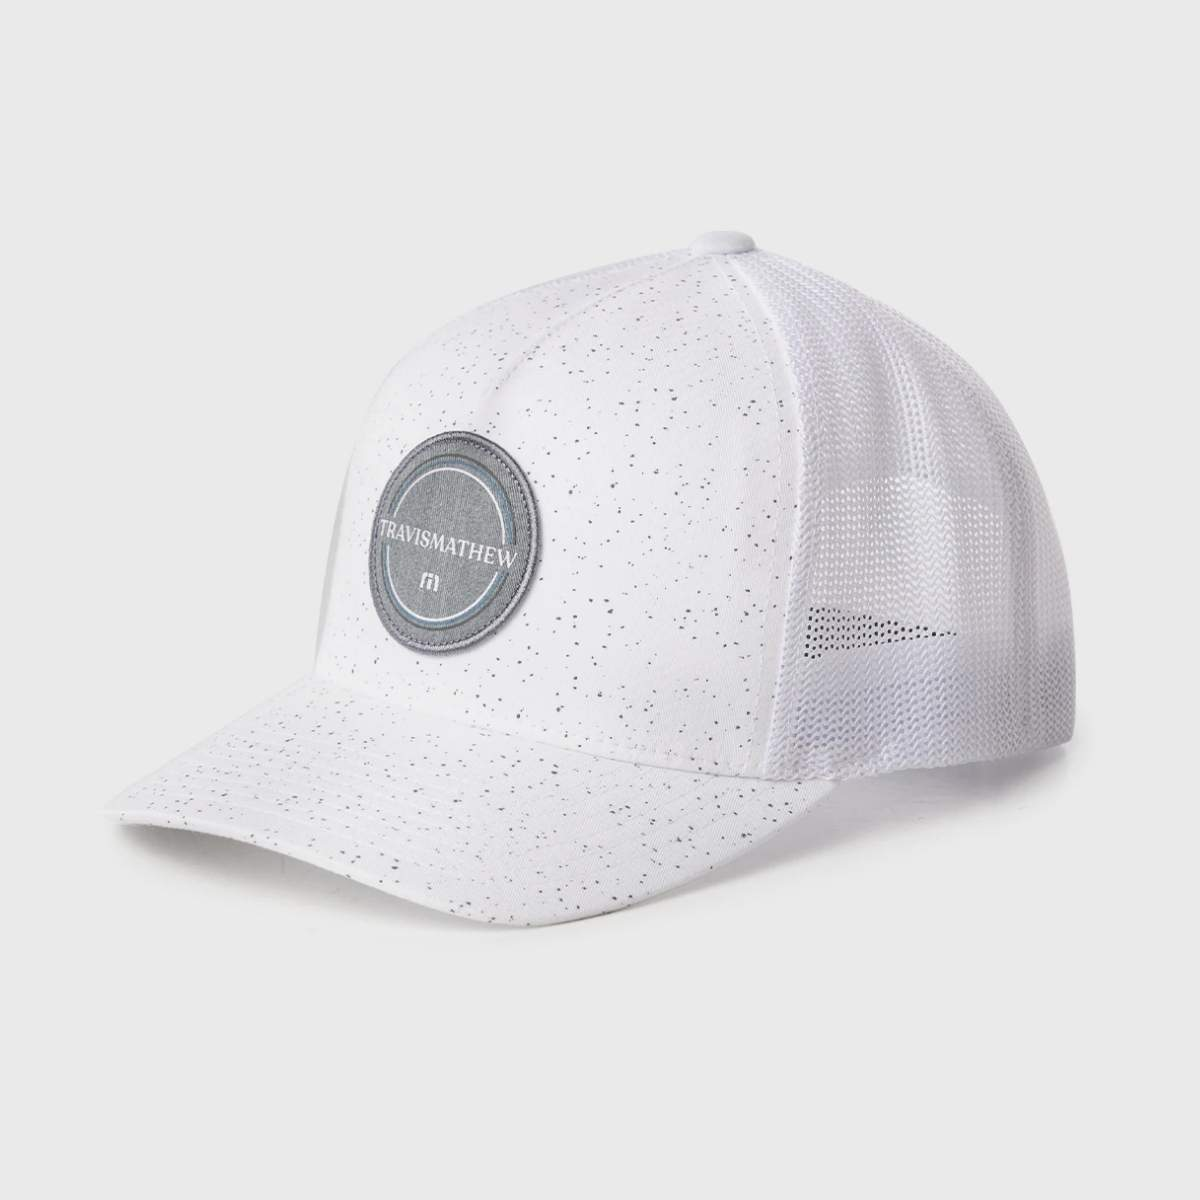 TravisMathew 2021 Party Central Adjustable Hat